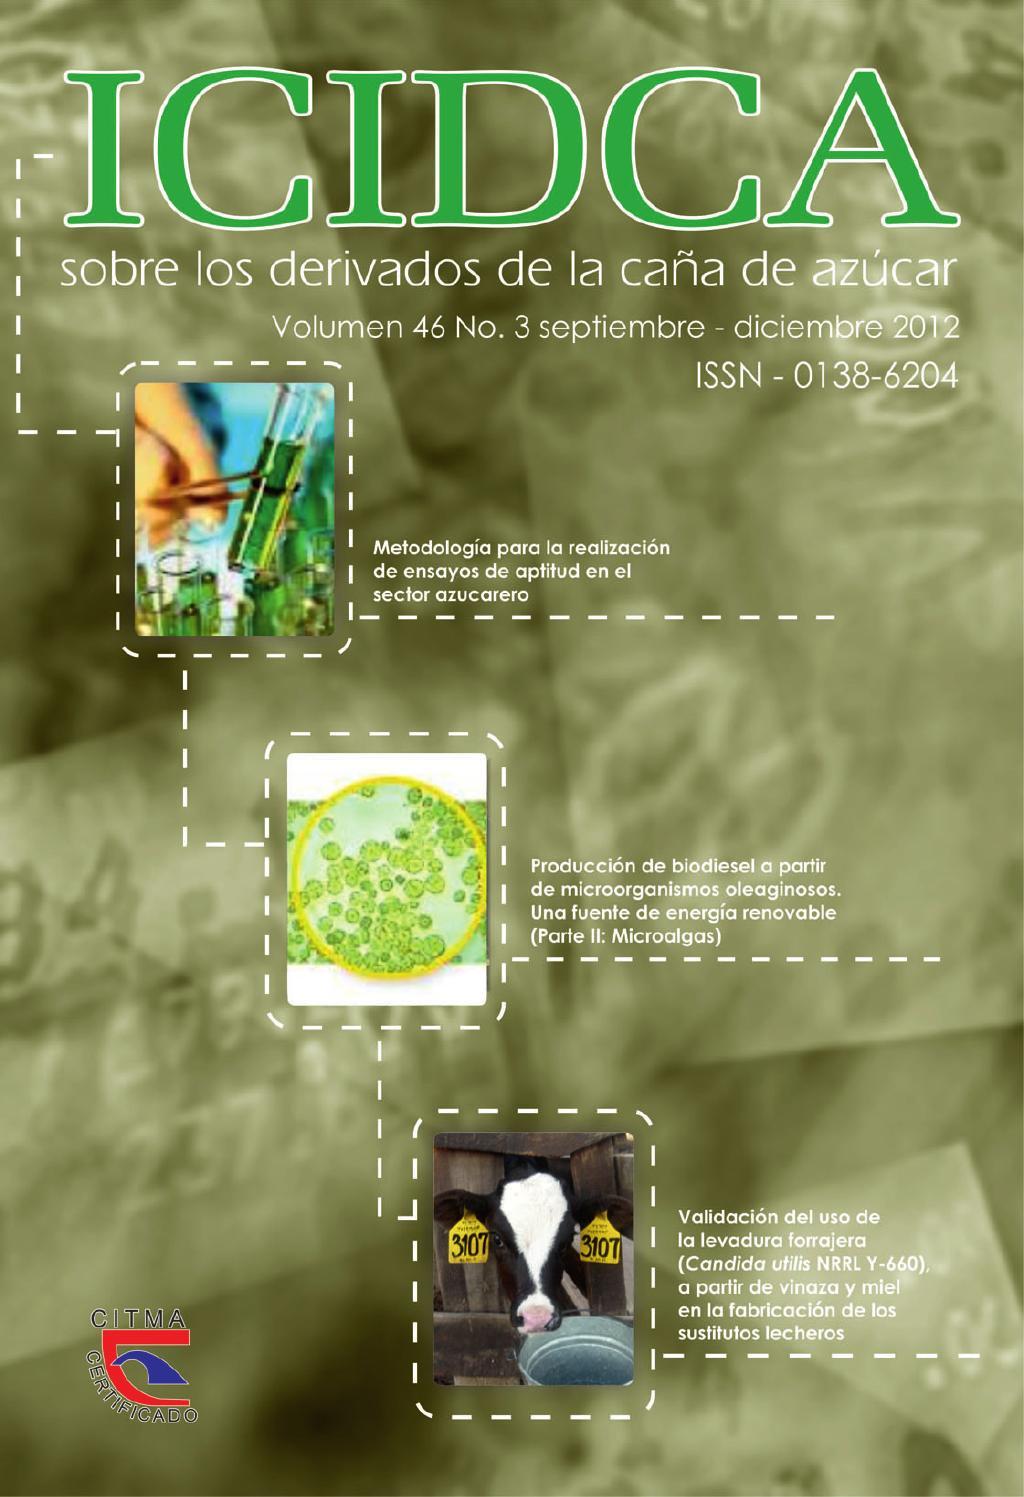 Revista icidca vol 46 no3 2012 by Revista ICIDCA - issuu